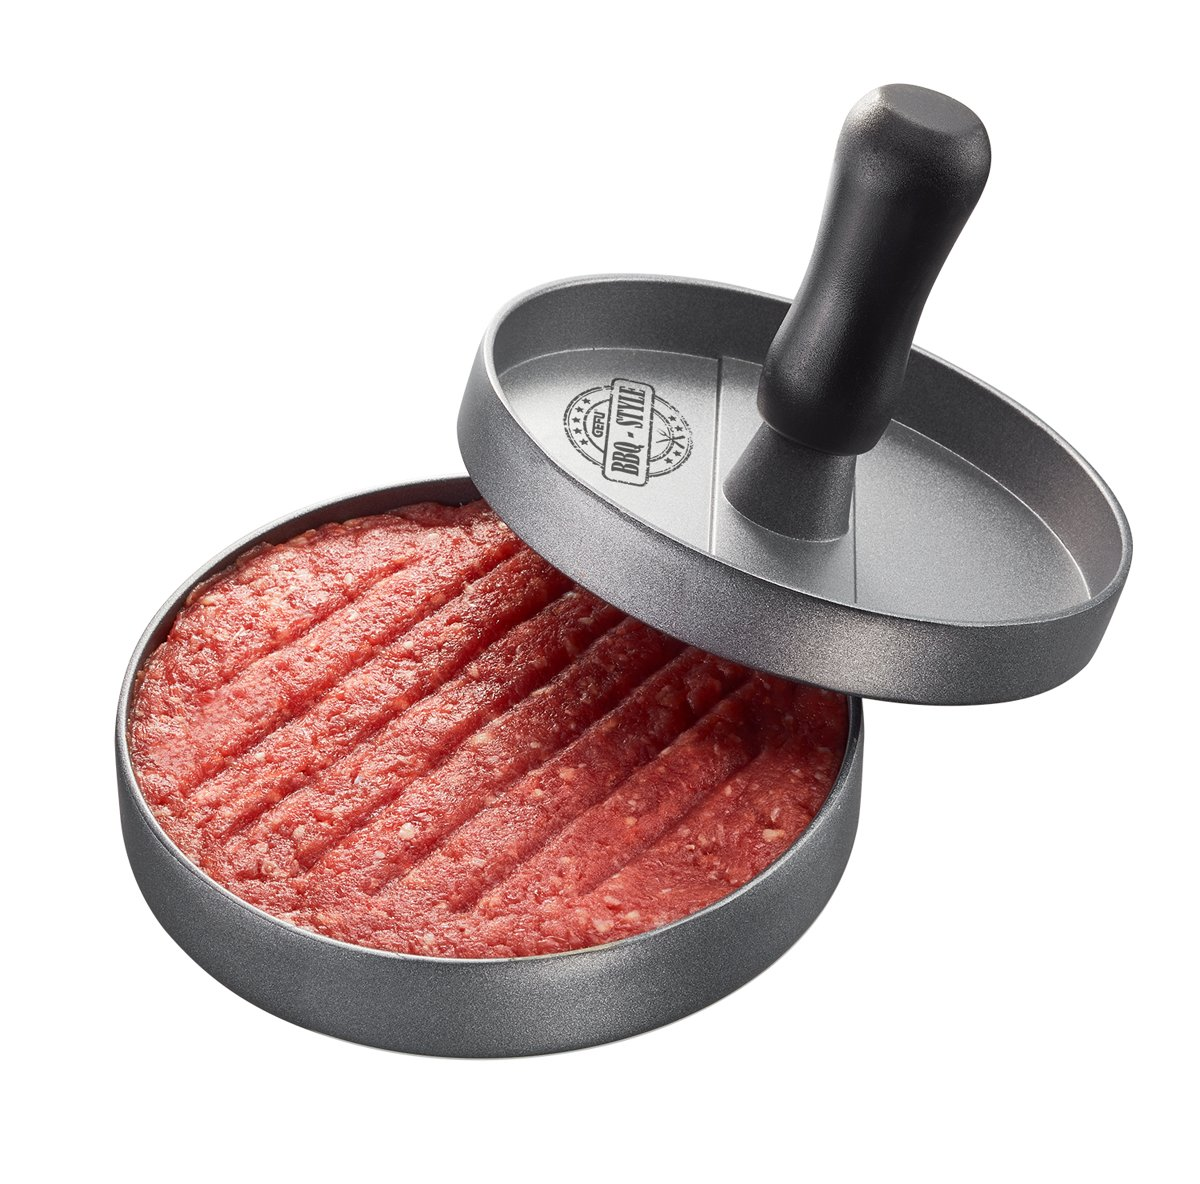 GEFU Hamburgerpers BBQ - aluminium - grijs kopen